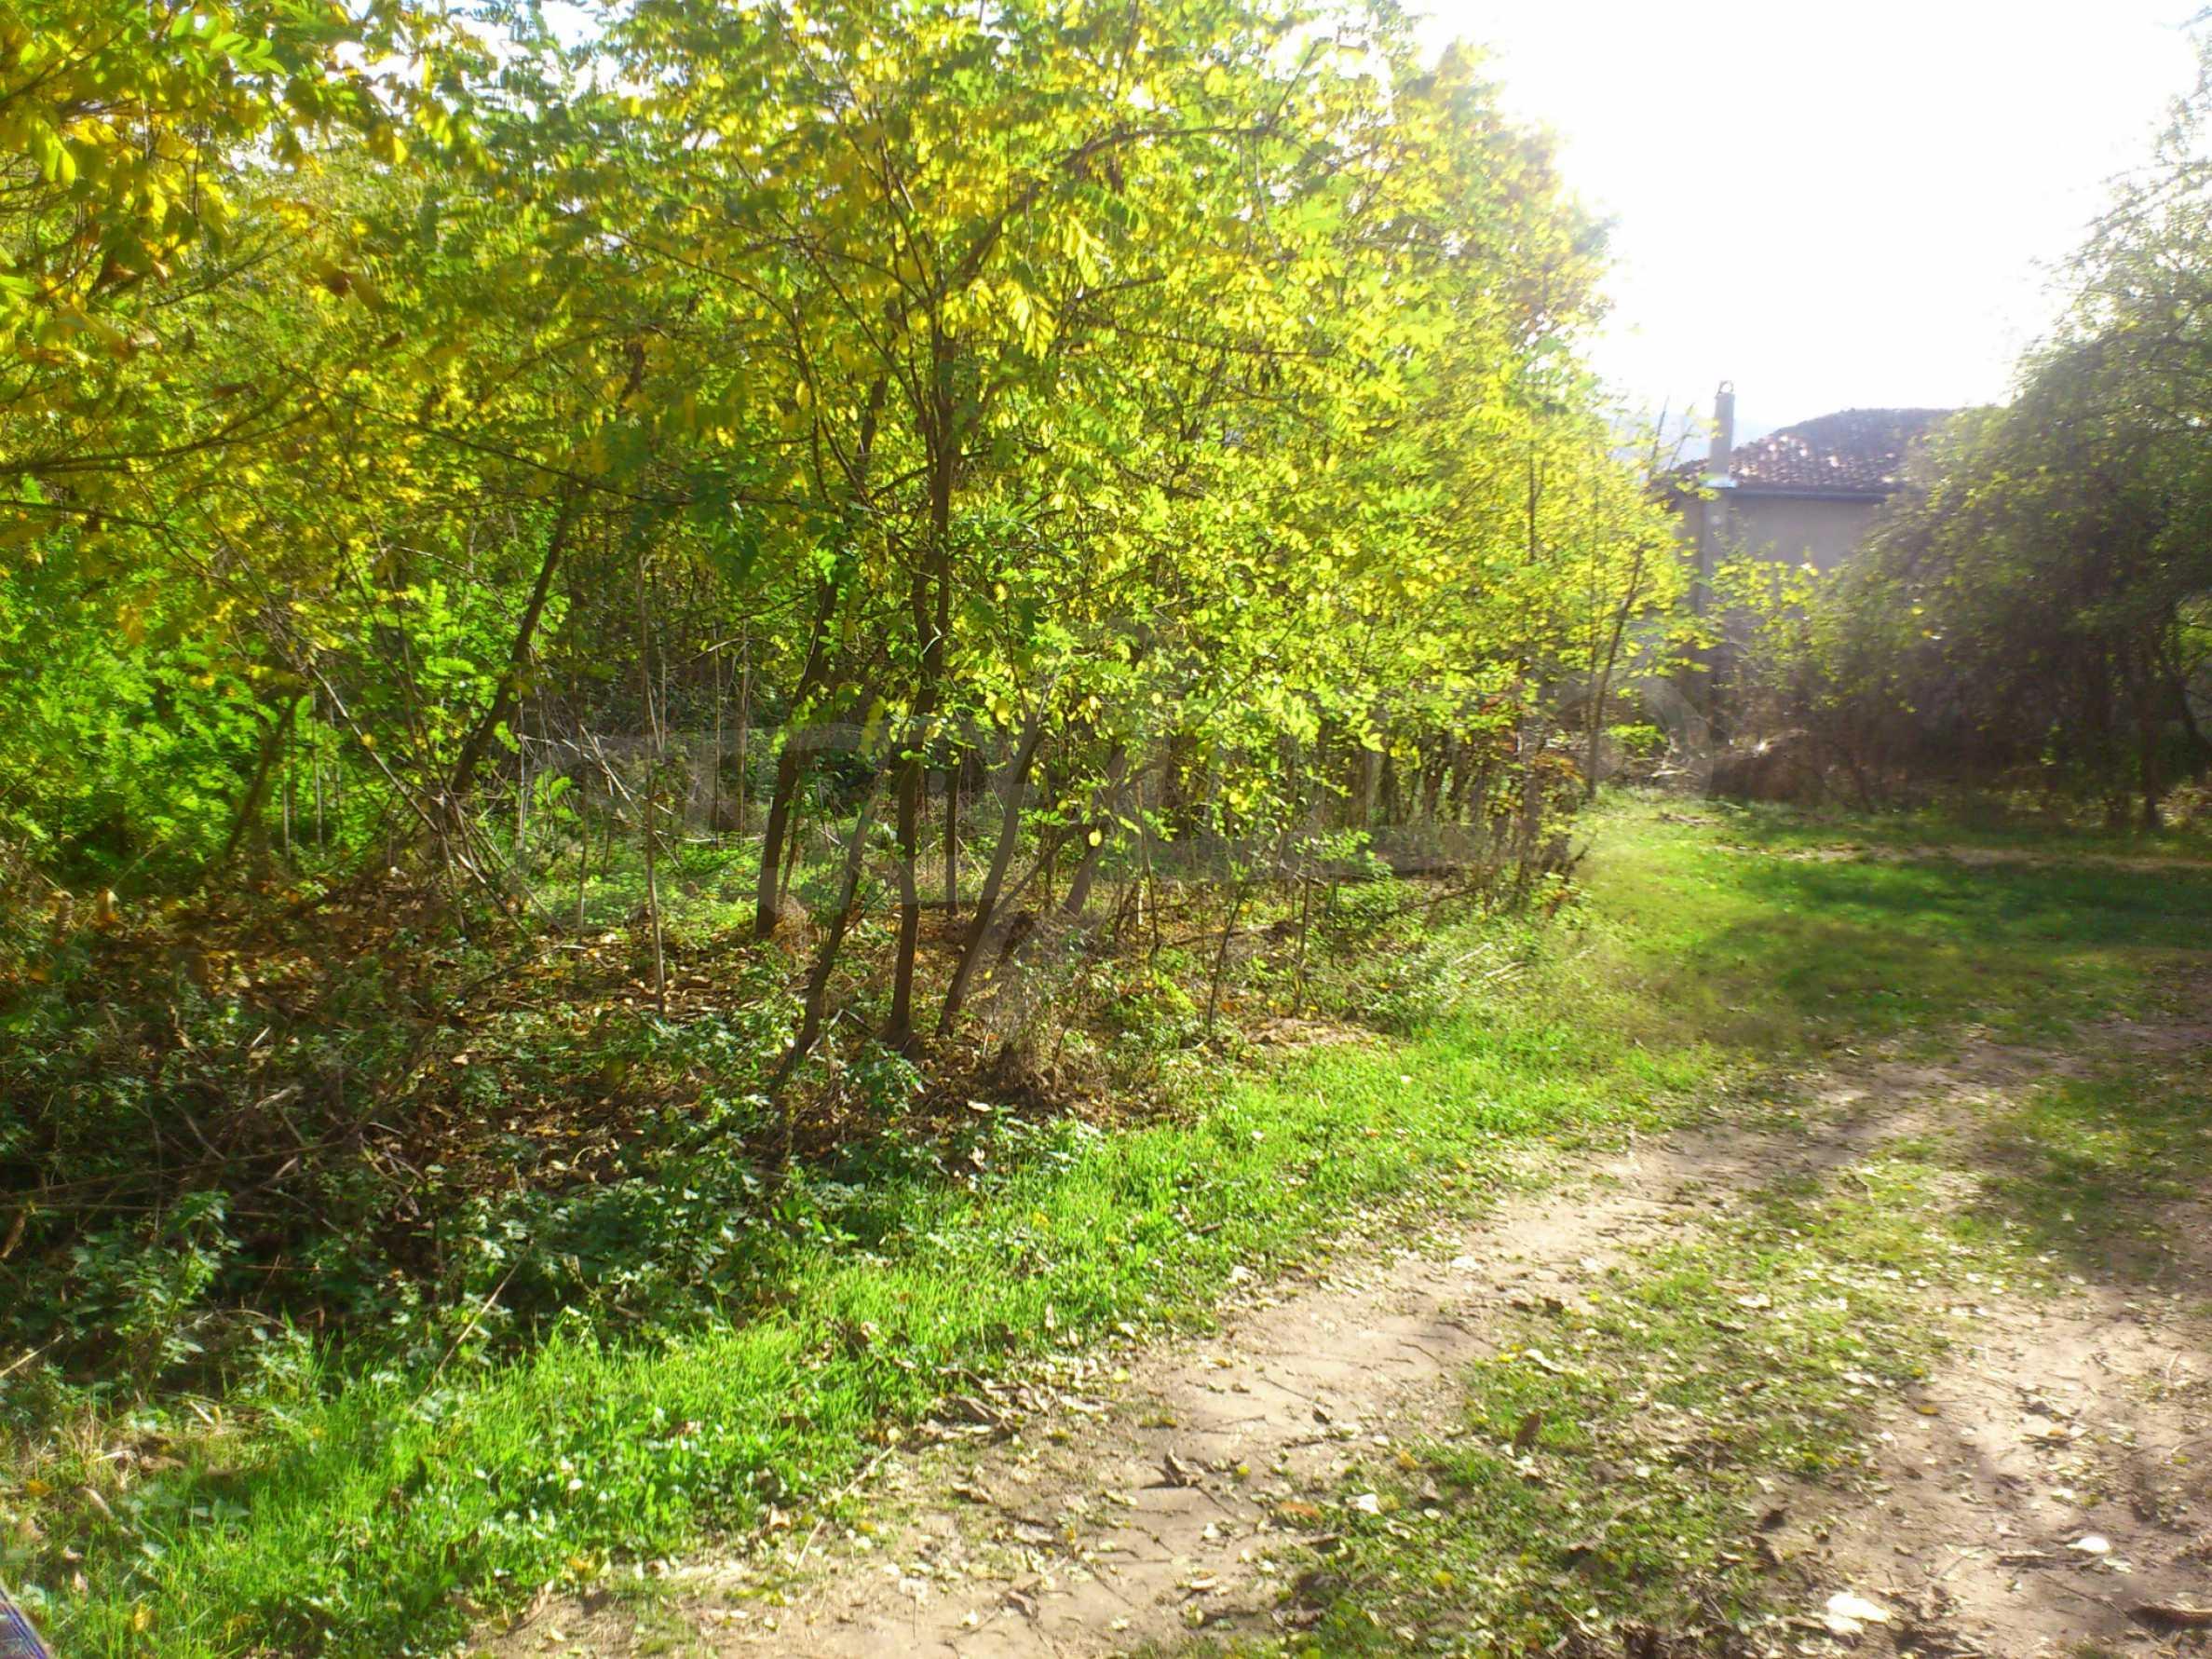 Hof nur 17 km von Veliko Tarnovo entfernt 11